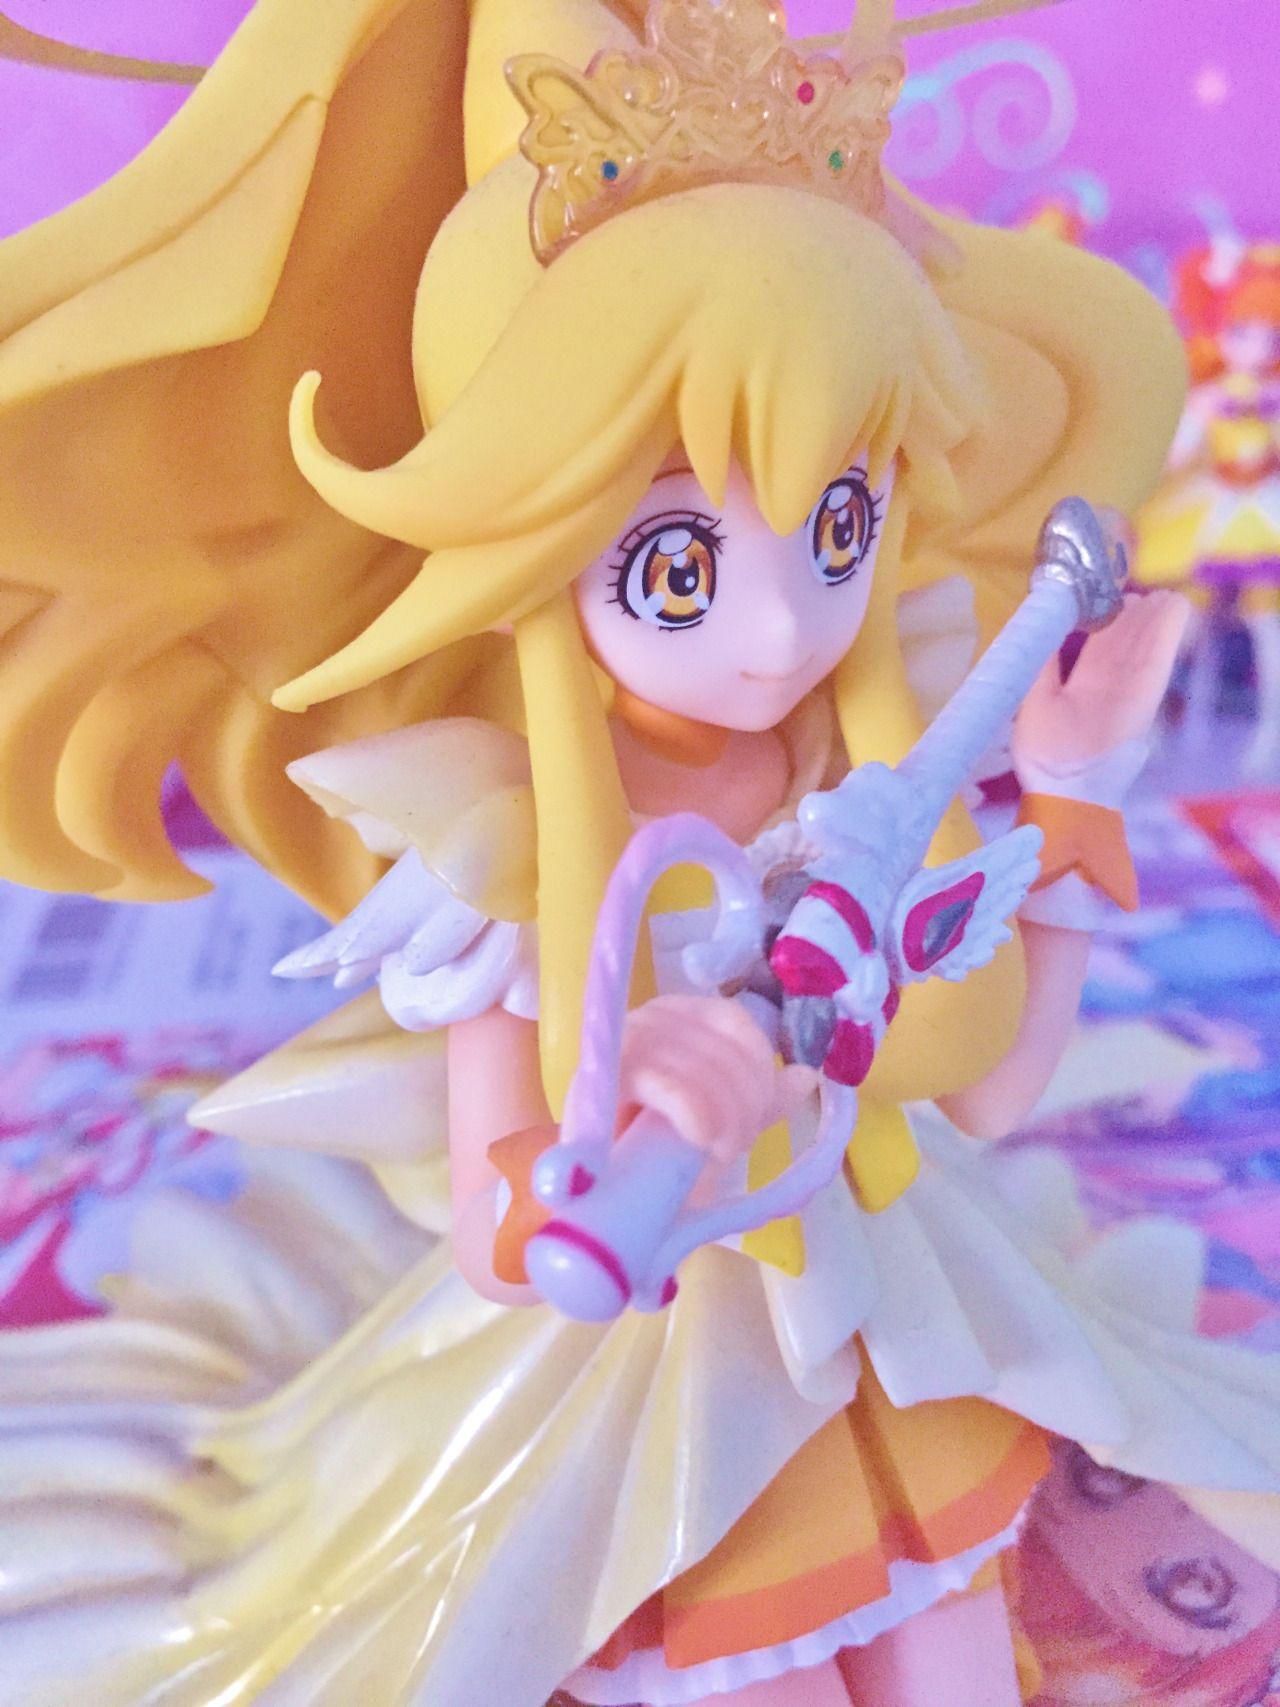 Princess Peace from Smile Precure Precure Glitter force